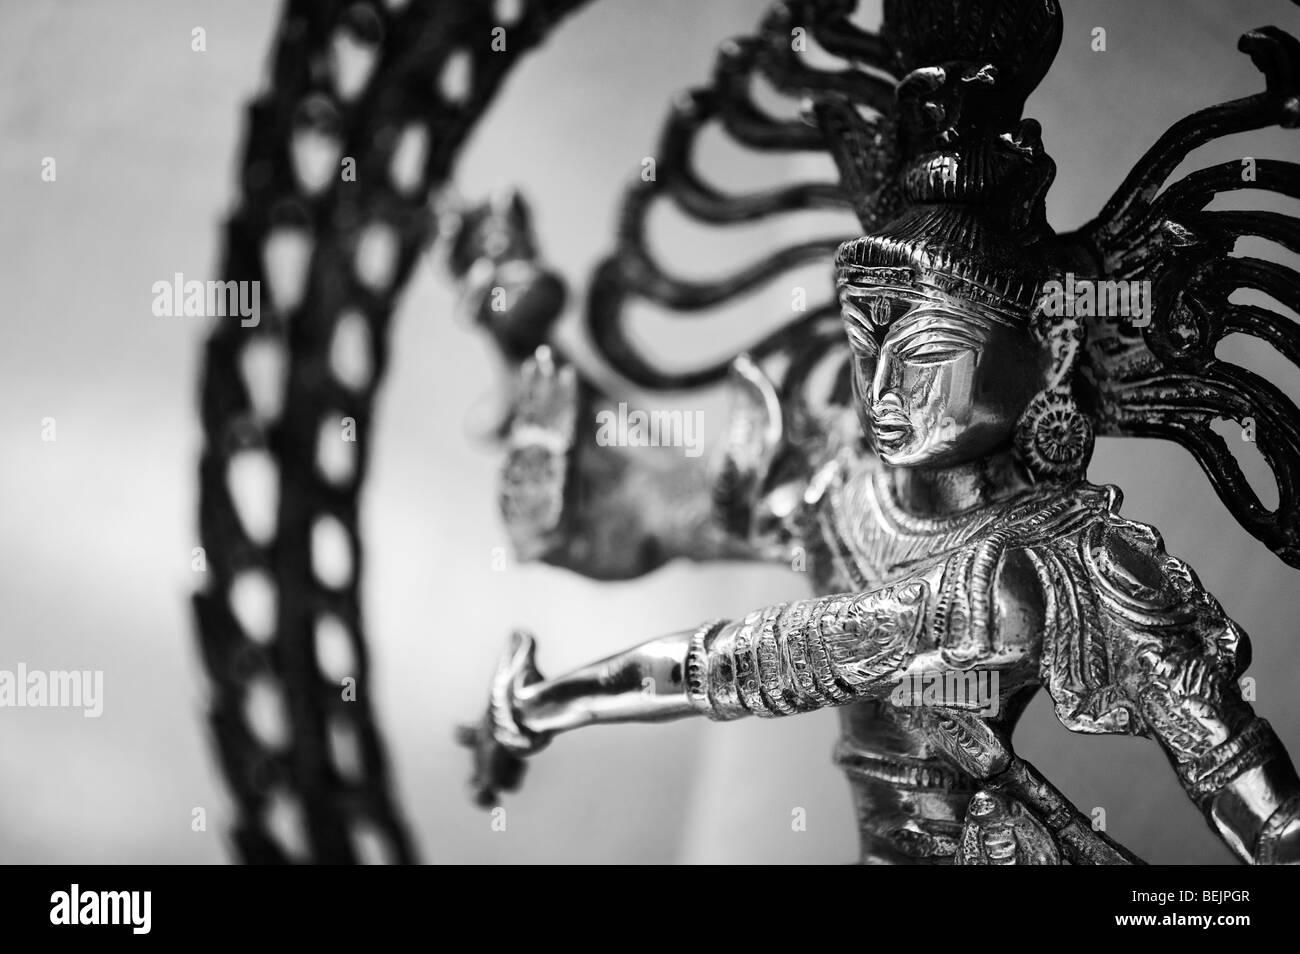 Dancing lord Shiva statue, Nataraja, Hindu God, monochrome - Stock Image